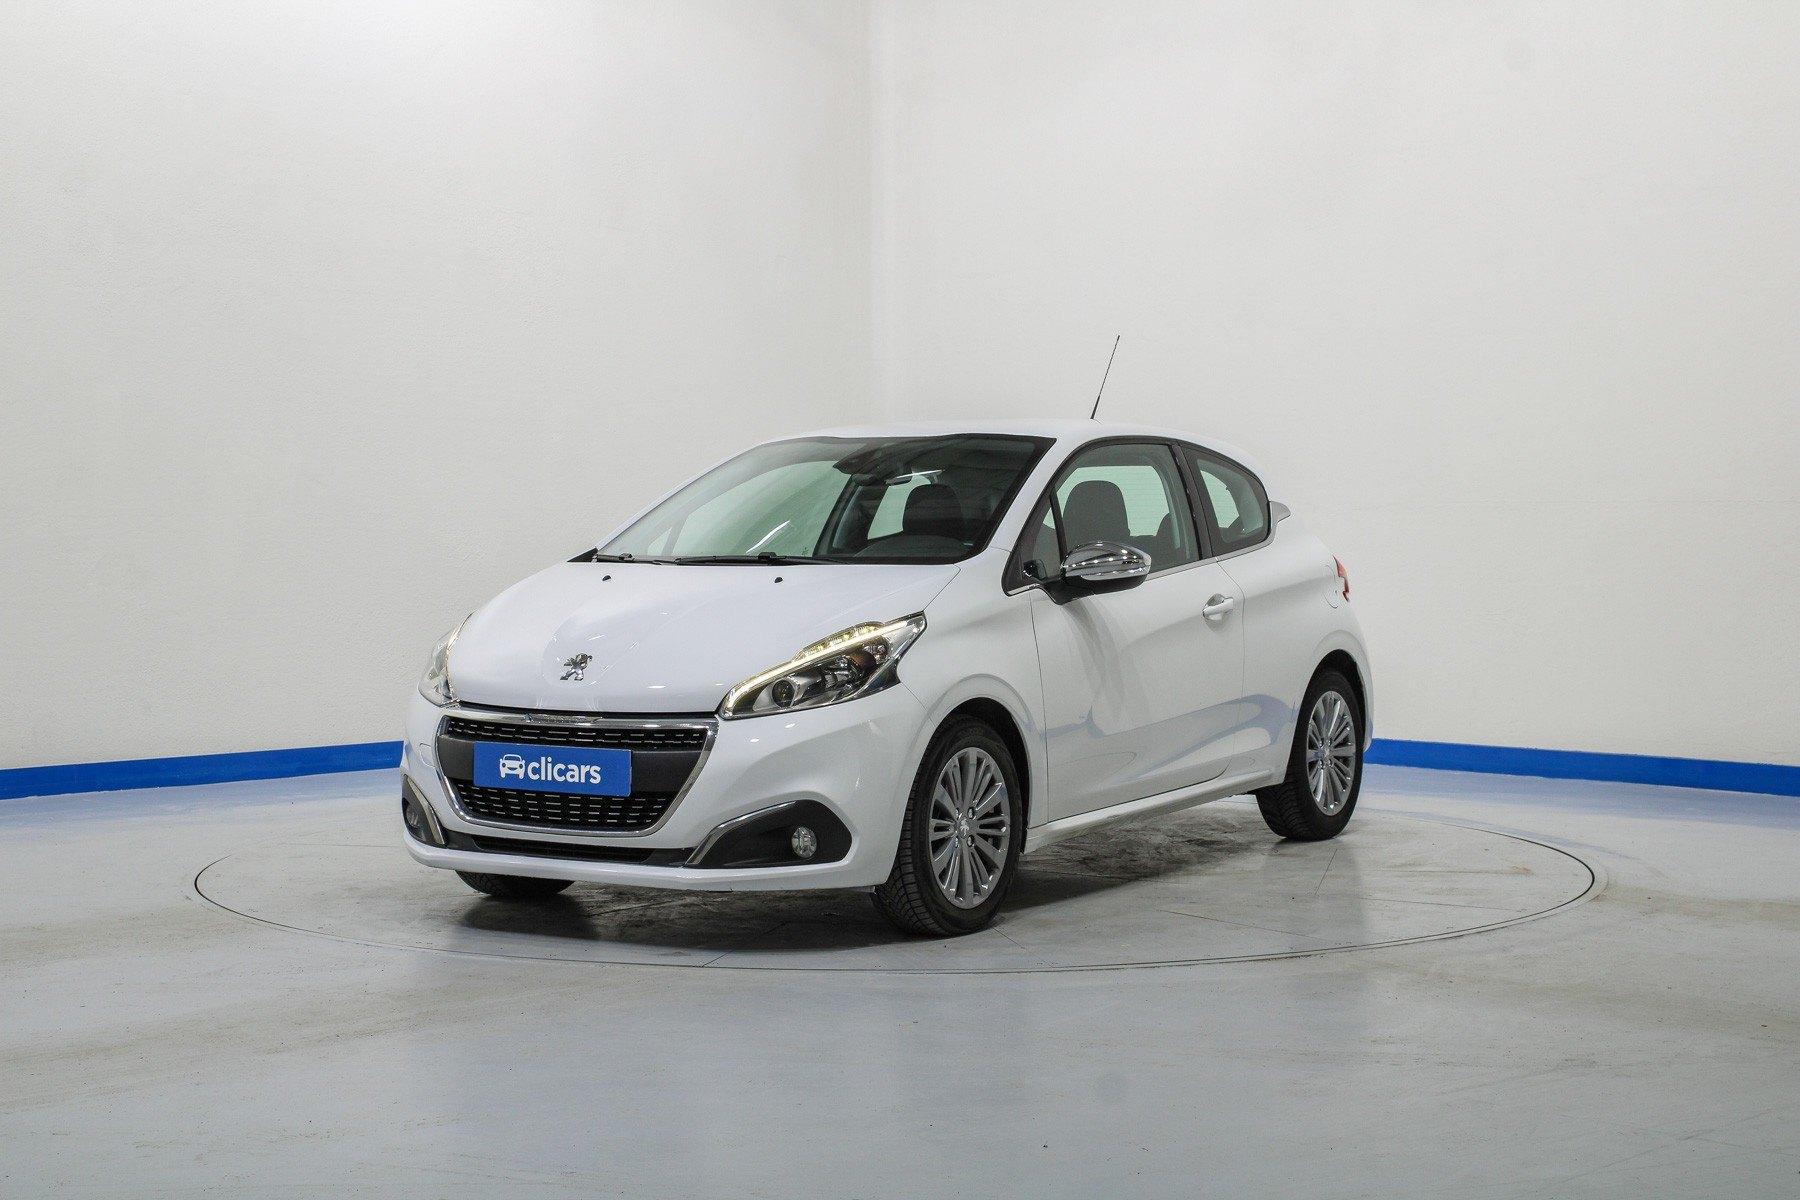 Peugeot 208 Diésel 3P ACTIVE 1.6 BlueHDi 100 1